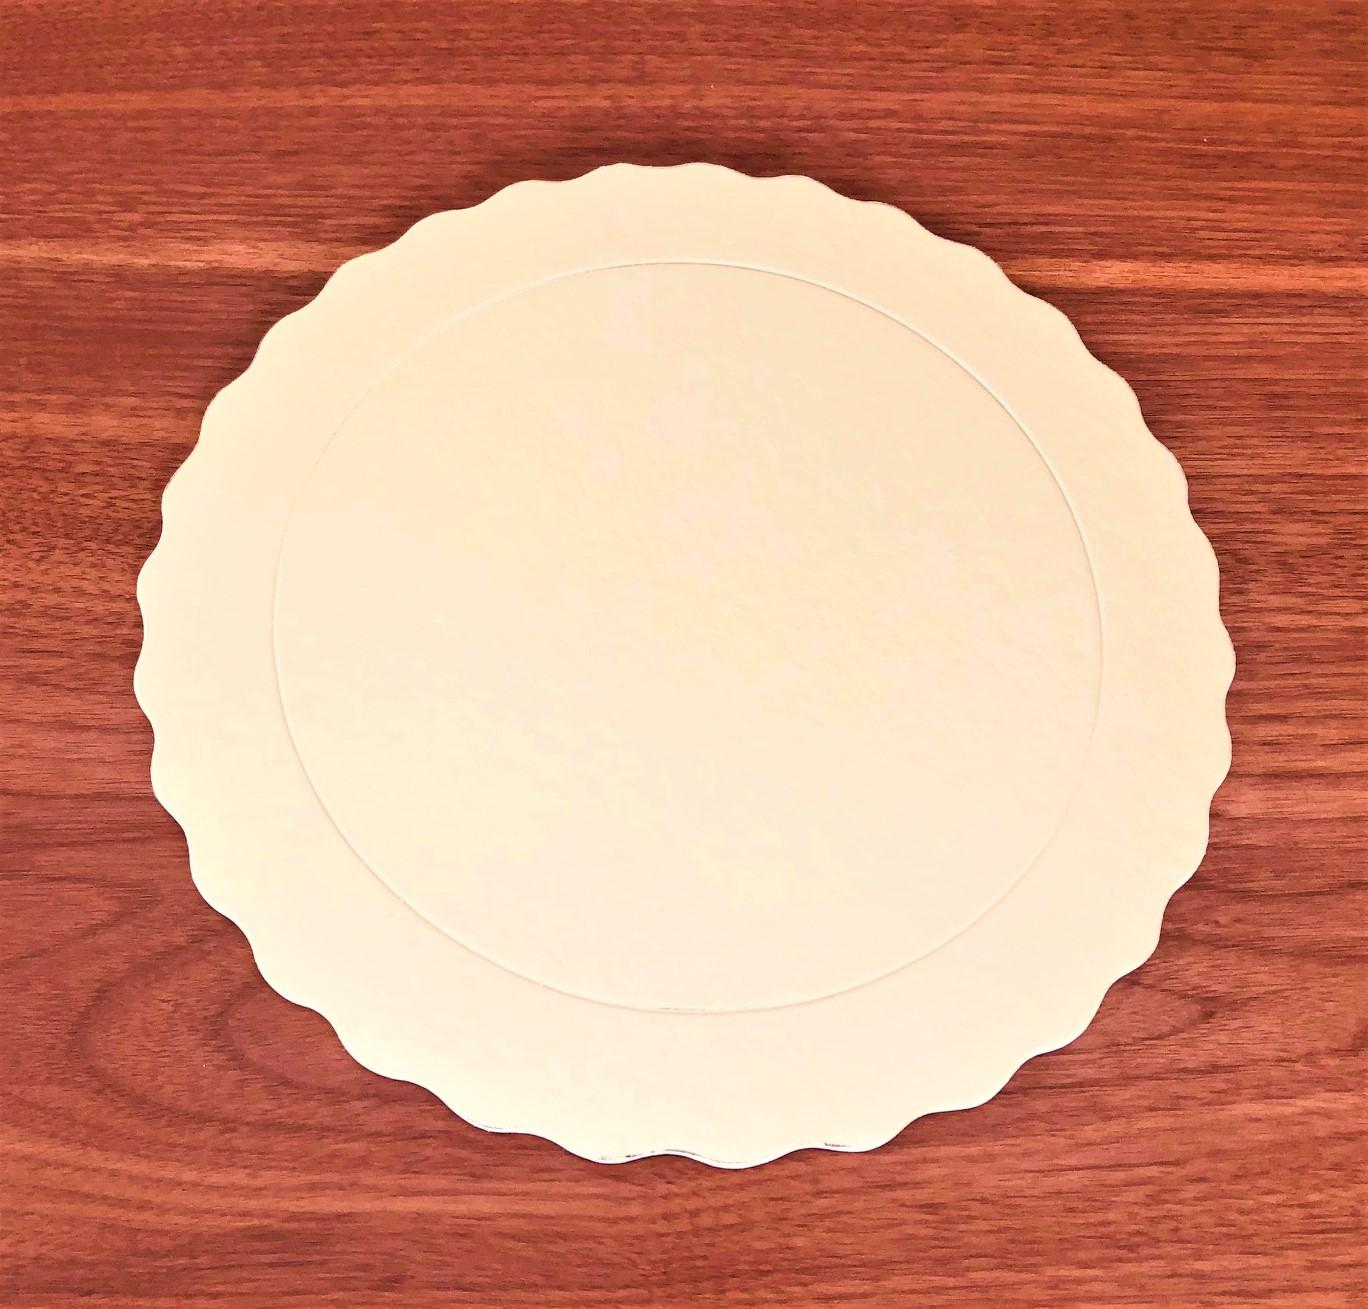 100 Bases Laminadas, Suporte P/ Bolo, Cake Board, 35cm - Ouro